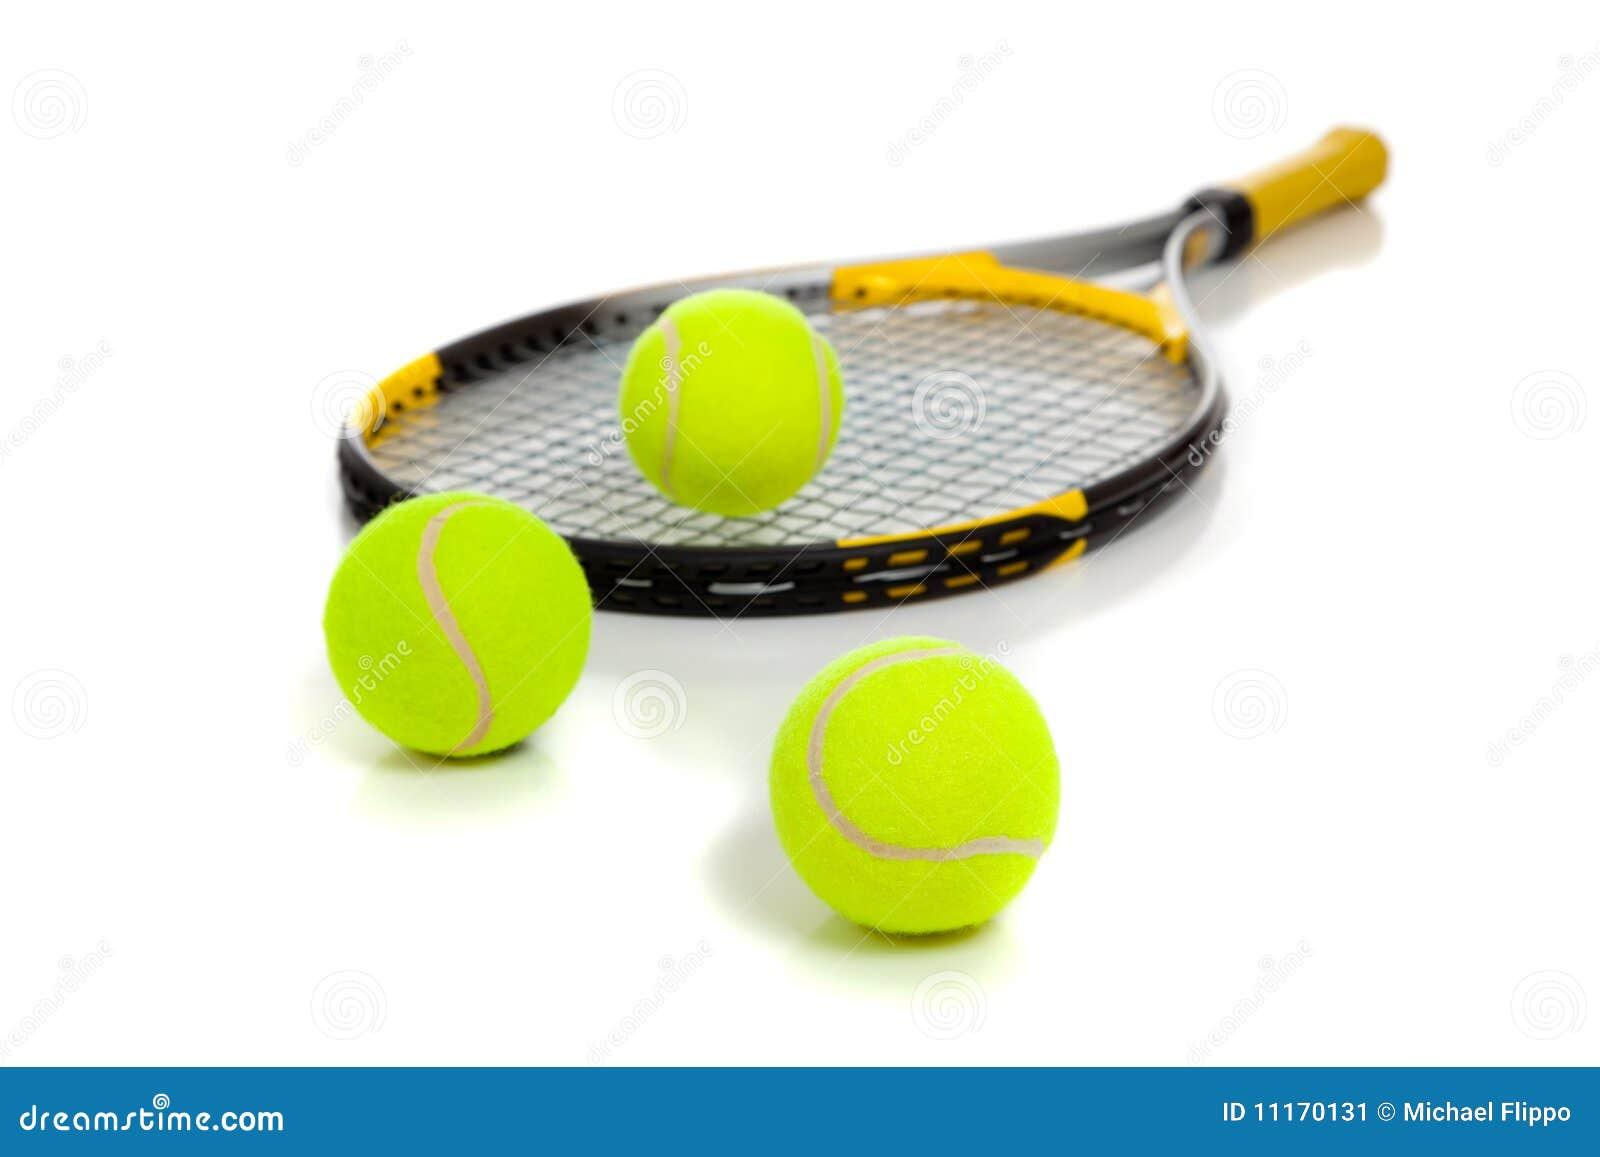 Tennis raquet with yellow balls on white